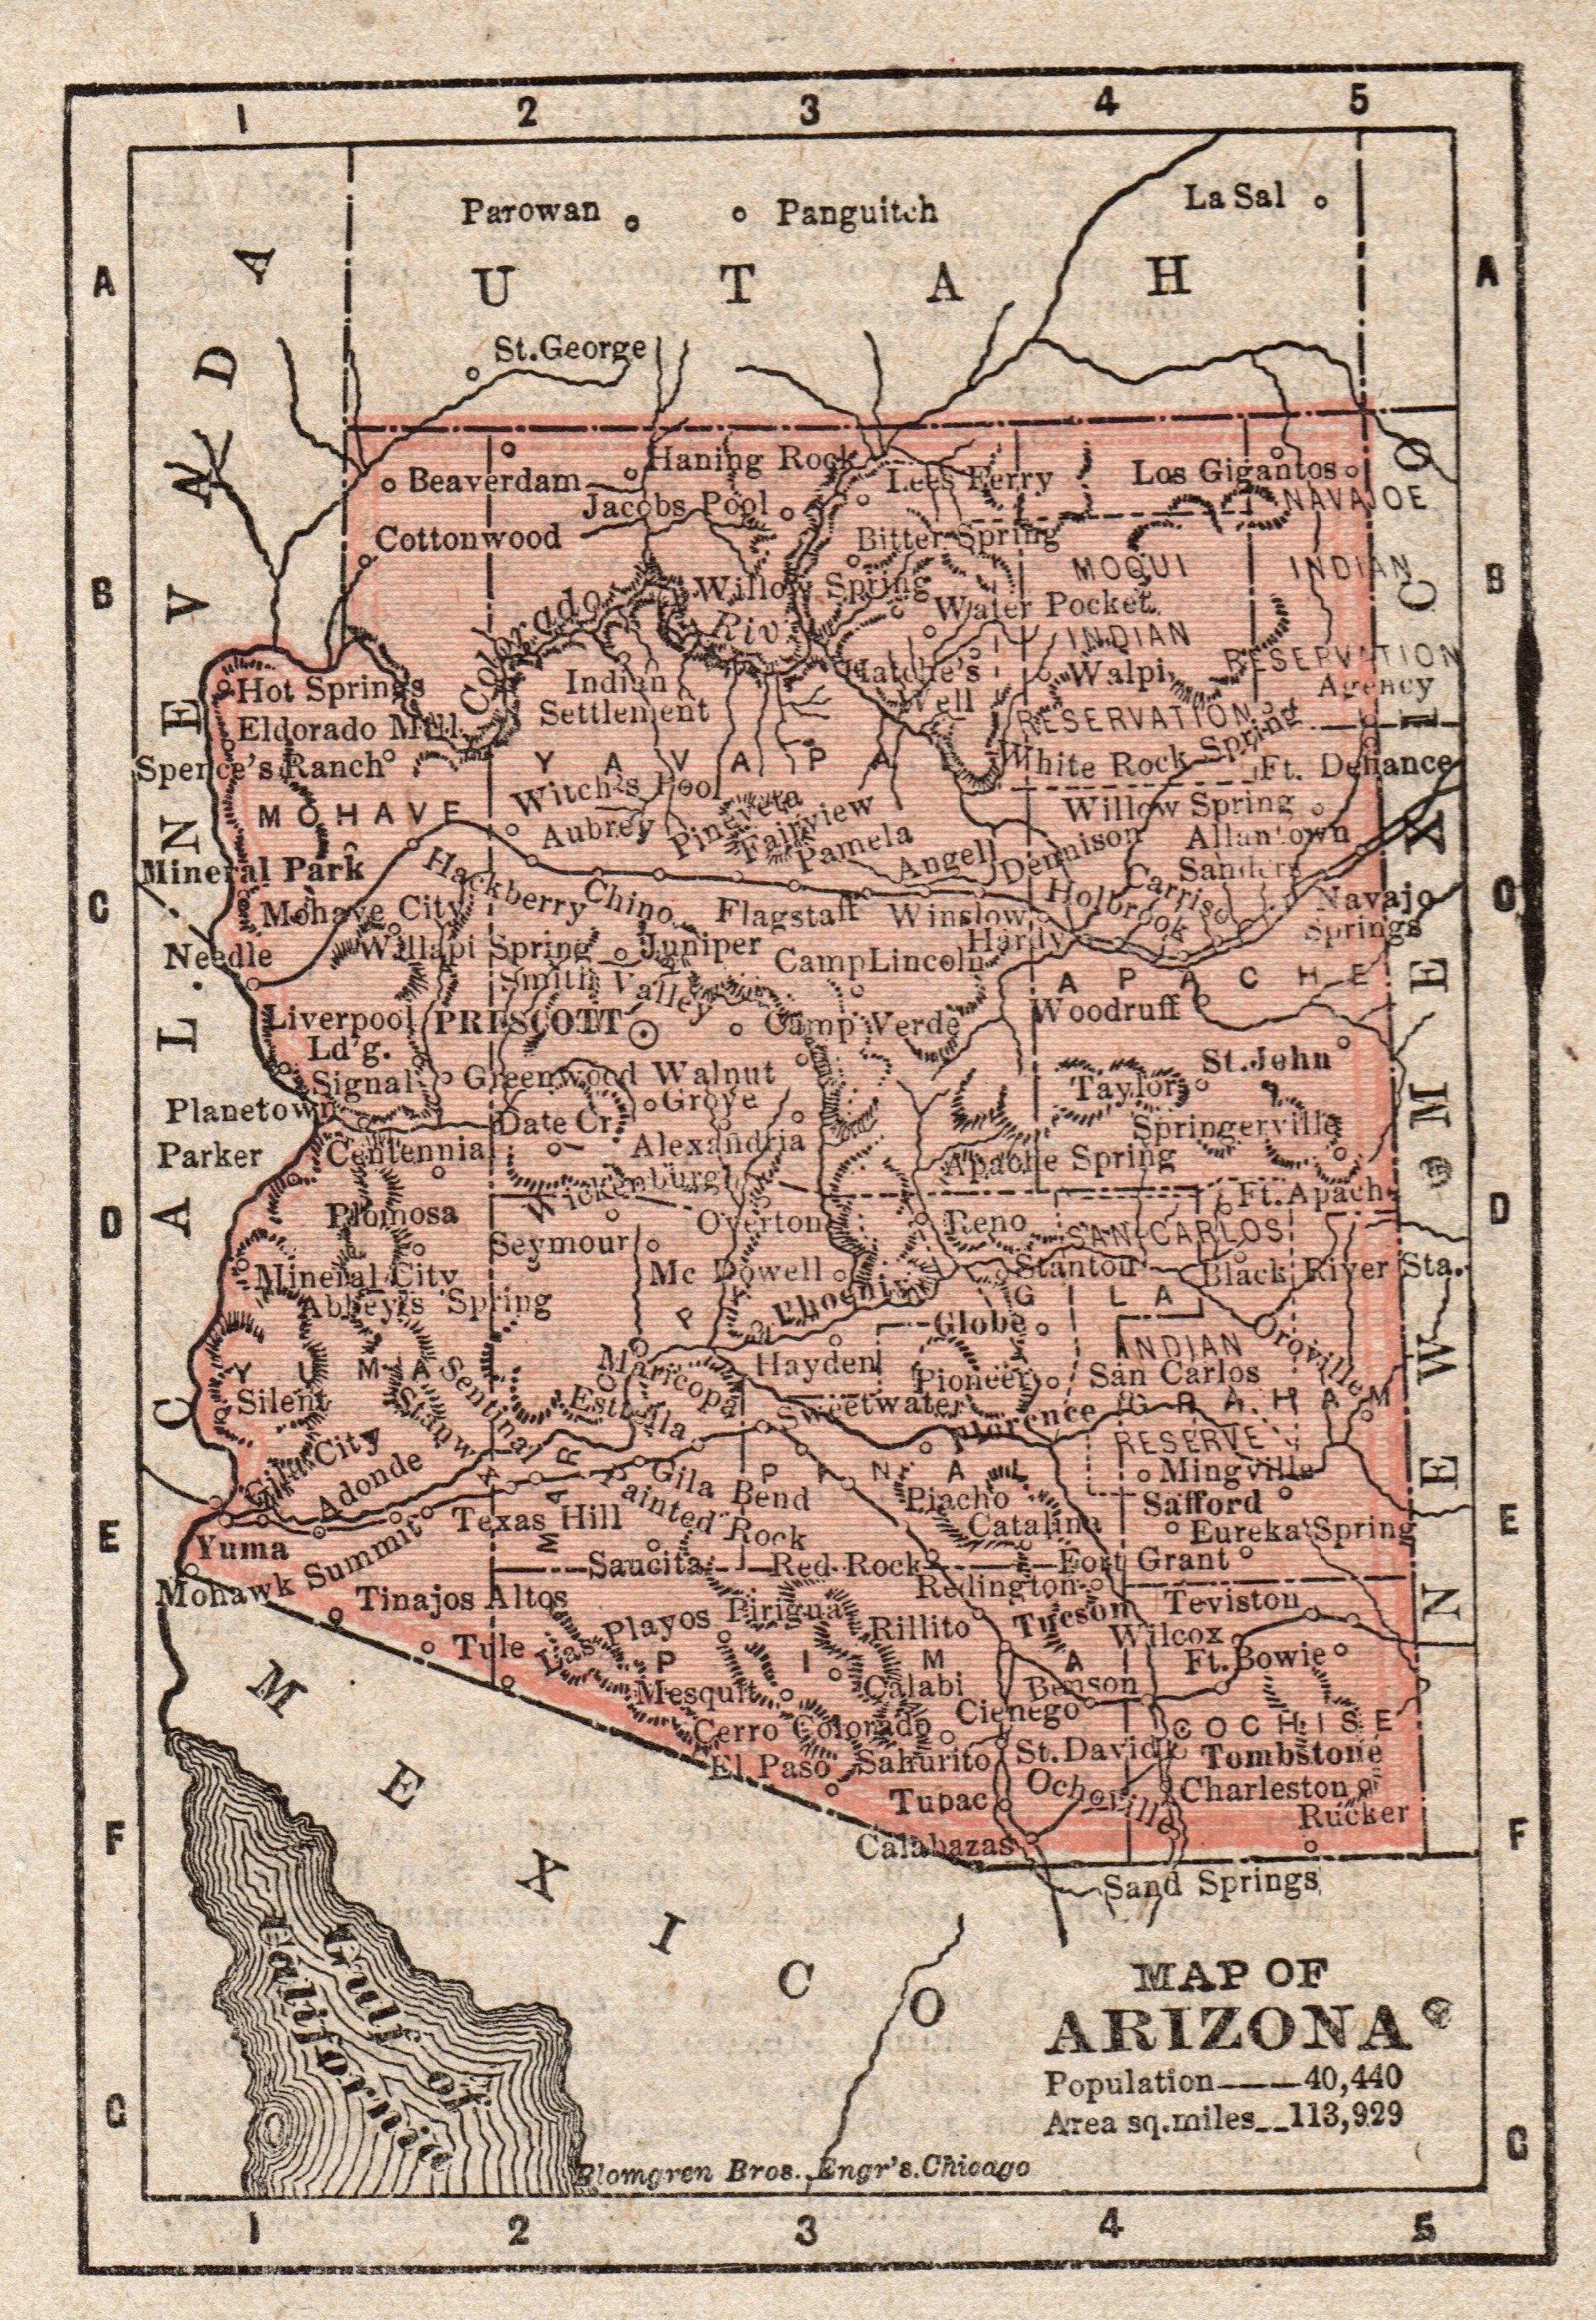 1888 Antique Arizona State Map Rare Miniature Size Arizona Map Etsy Arizona Map Miniature Map Arizona State Map